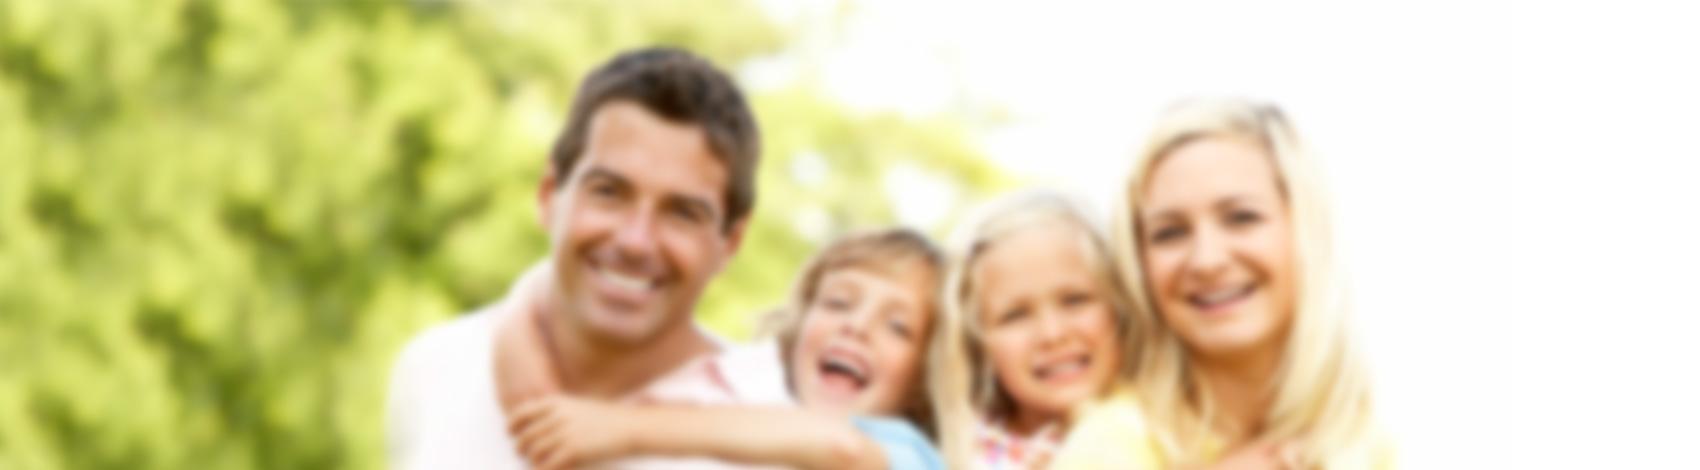 family-blur